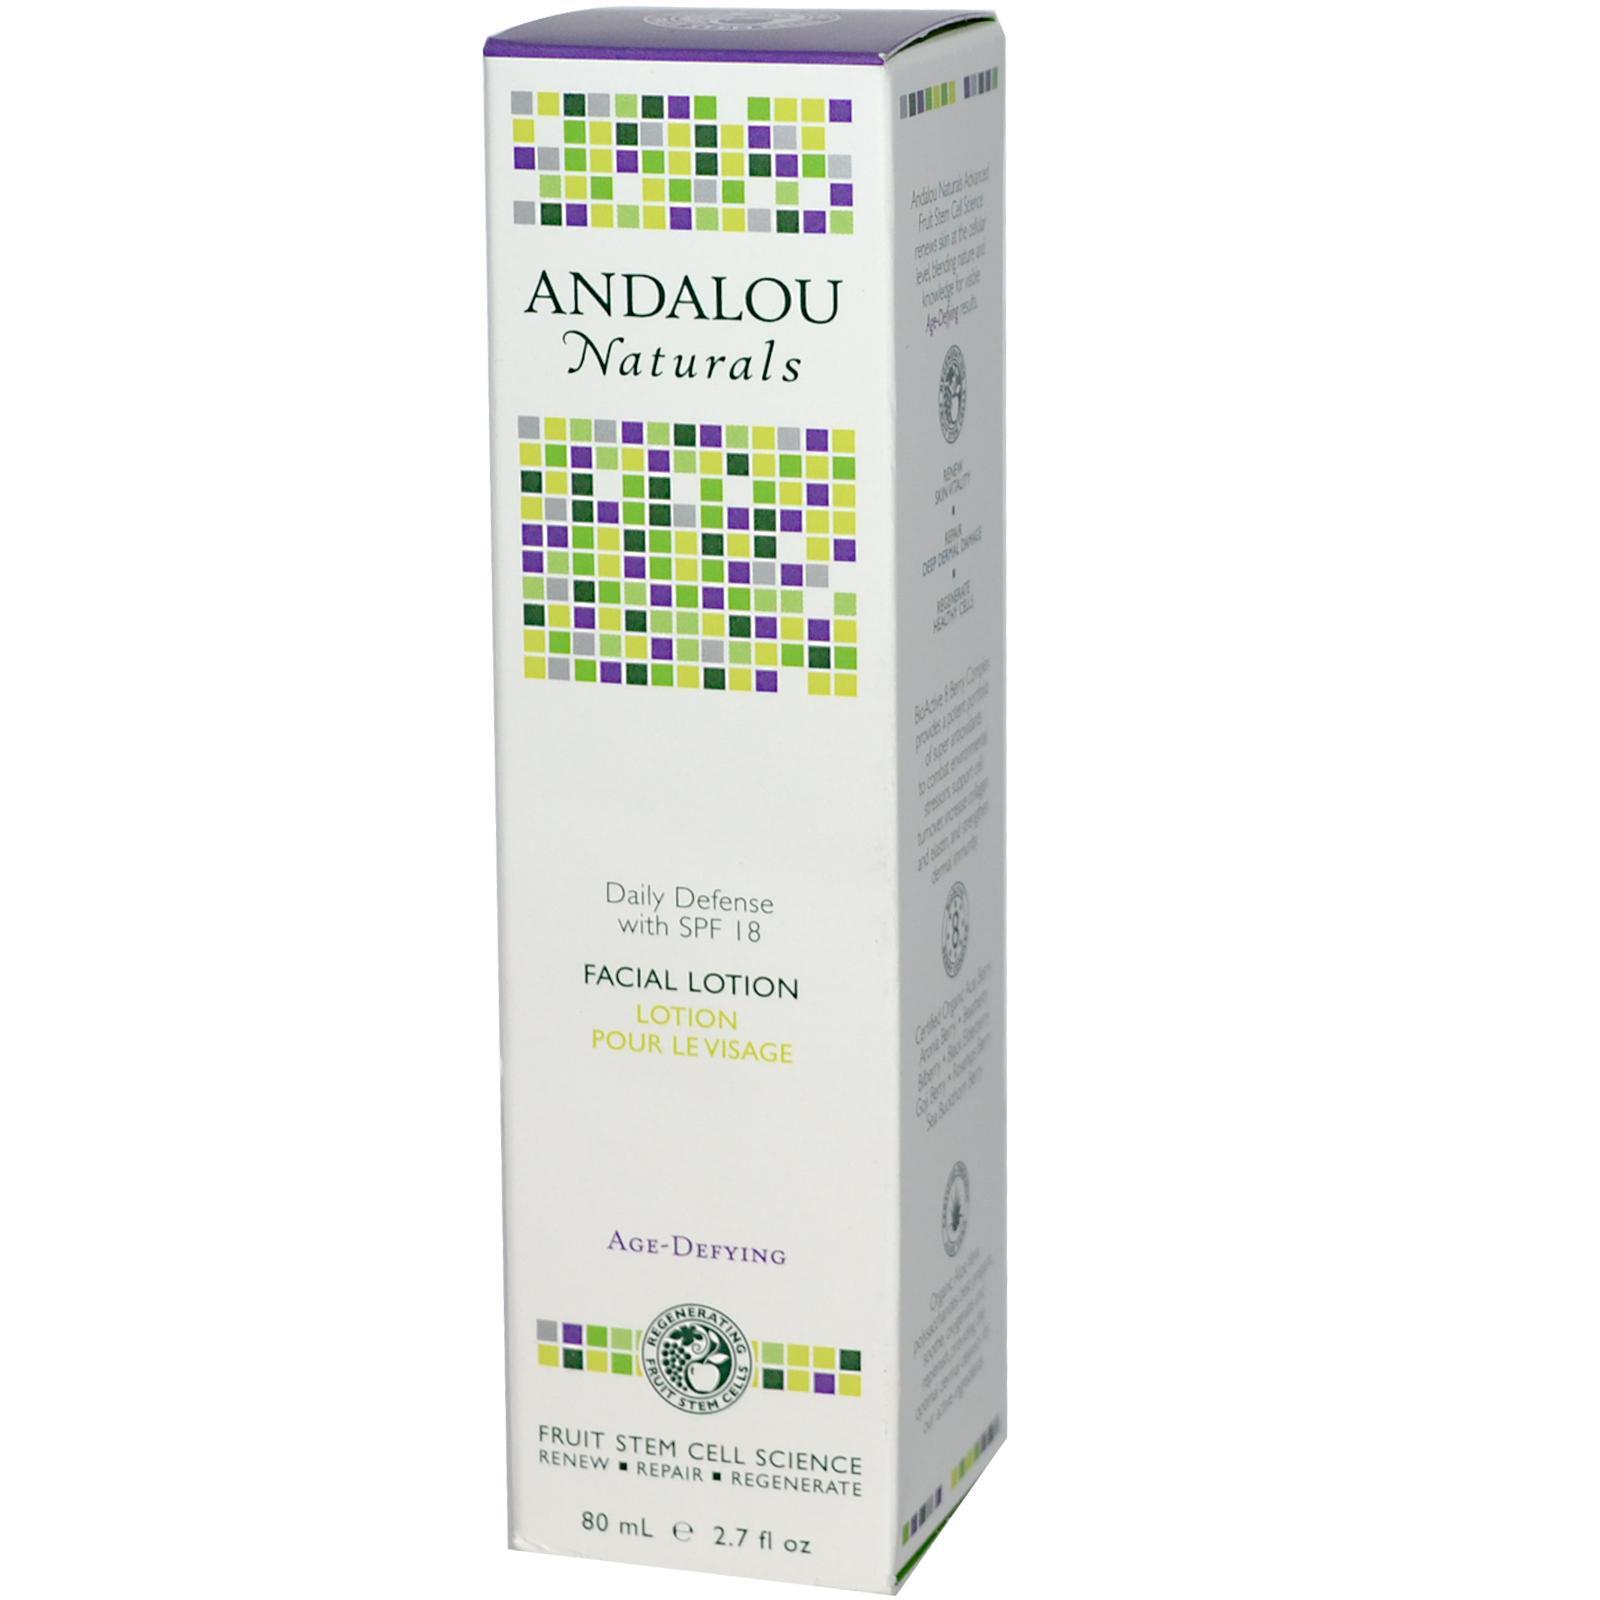 Andalou Naturals Daily Defense Facial Lotion w/ SPF 18 (1x27 Oz)